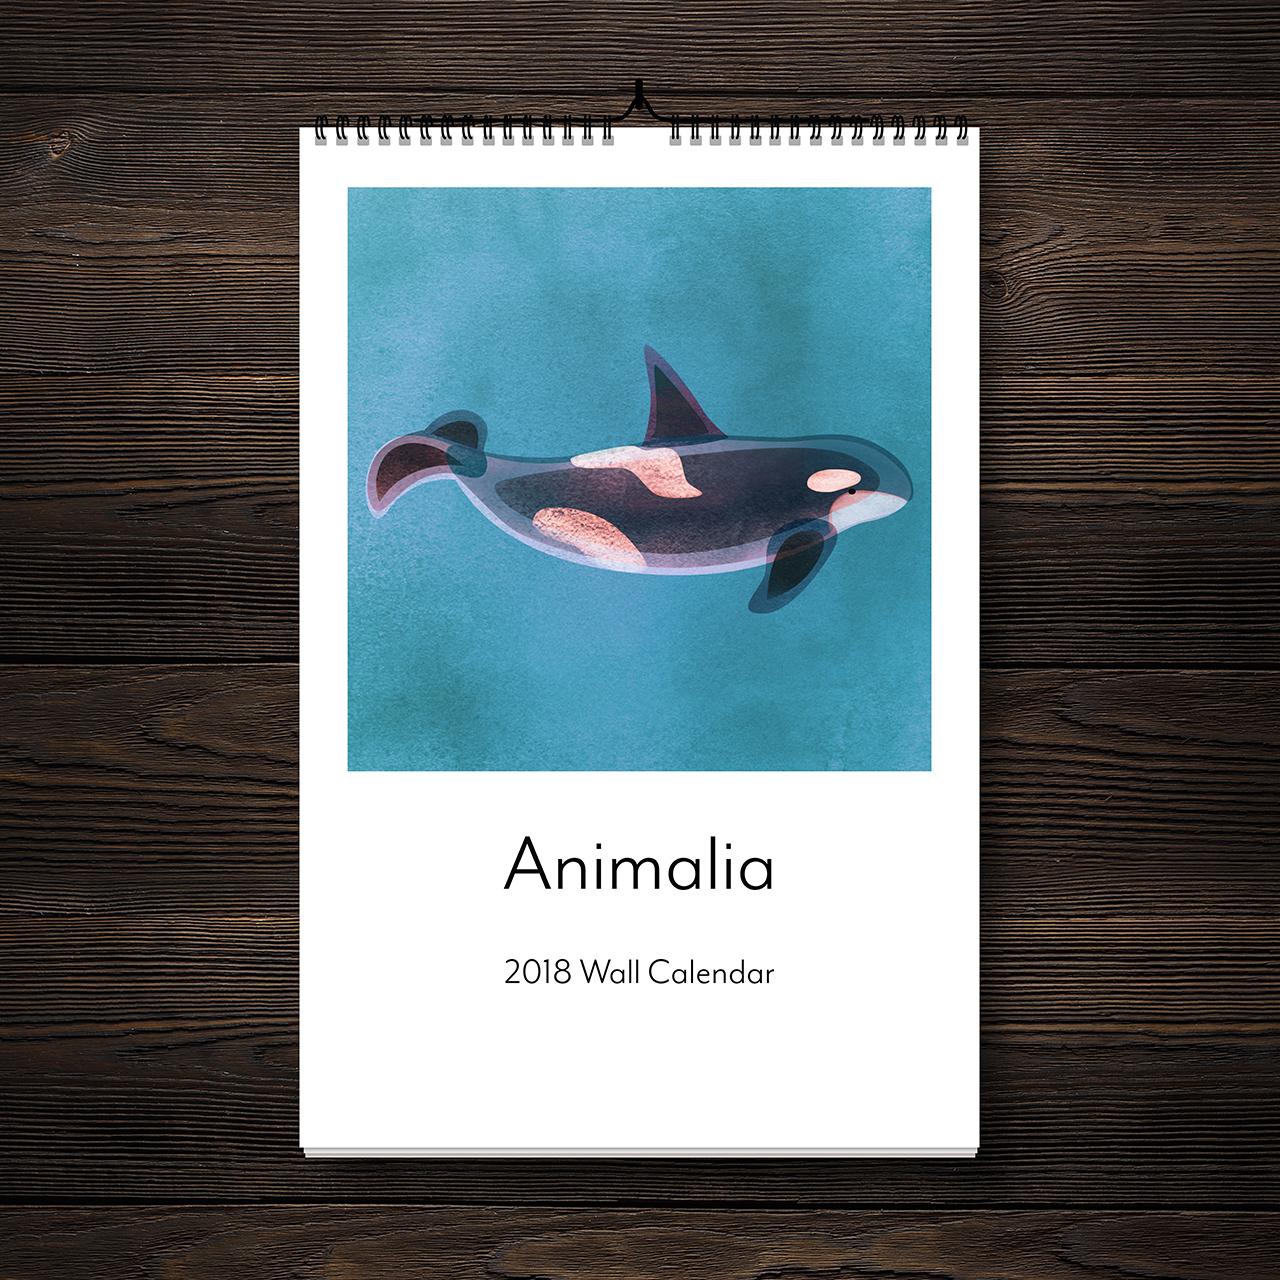 animalia wall calendarcover1.jpg